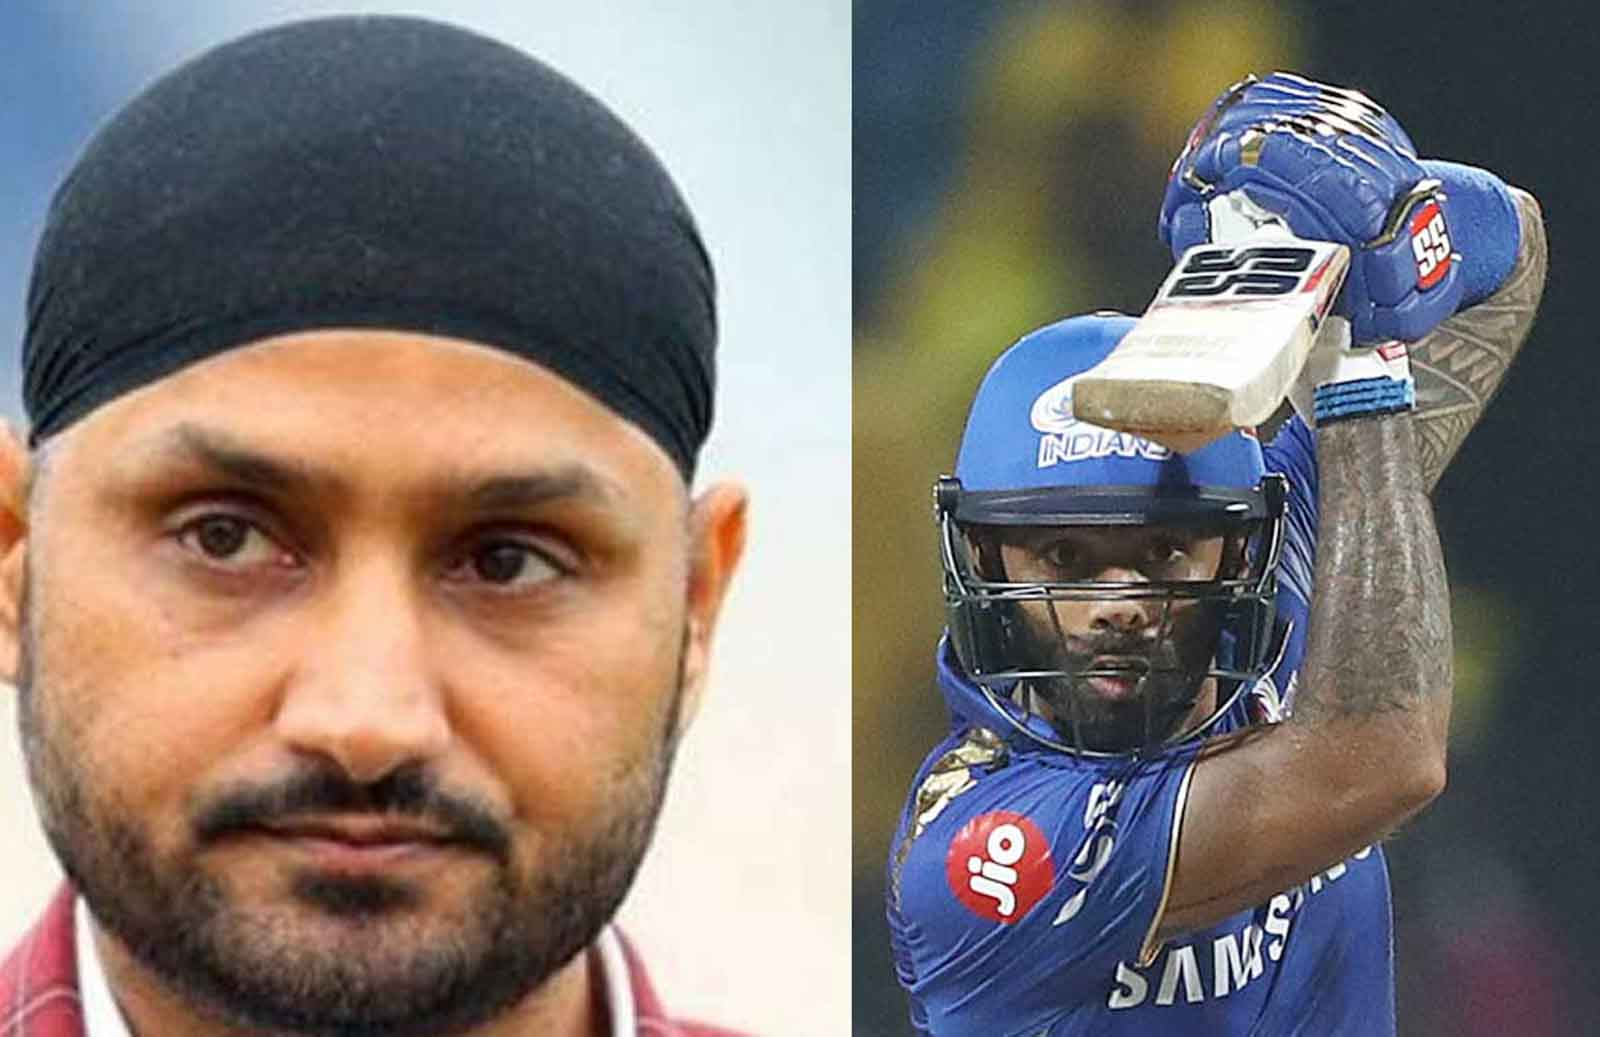 Suryakumar Yadav Is The Indian AB de Villiers- Harbhajan Singh